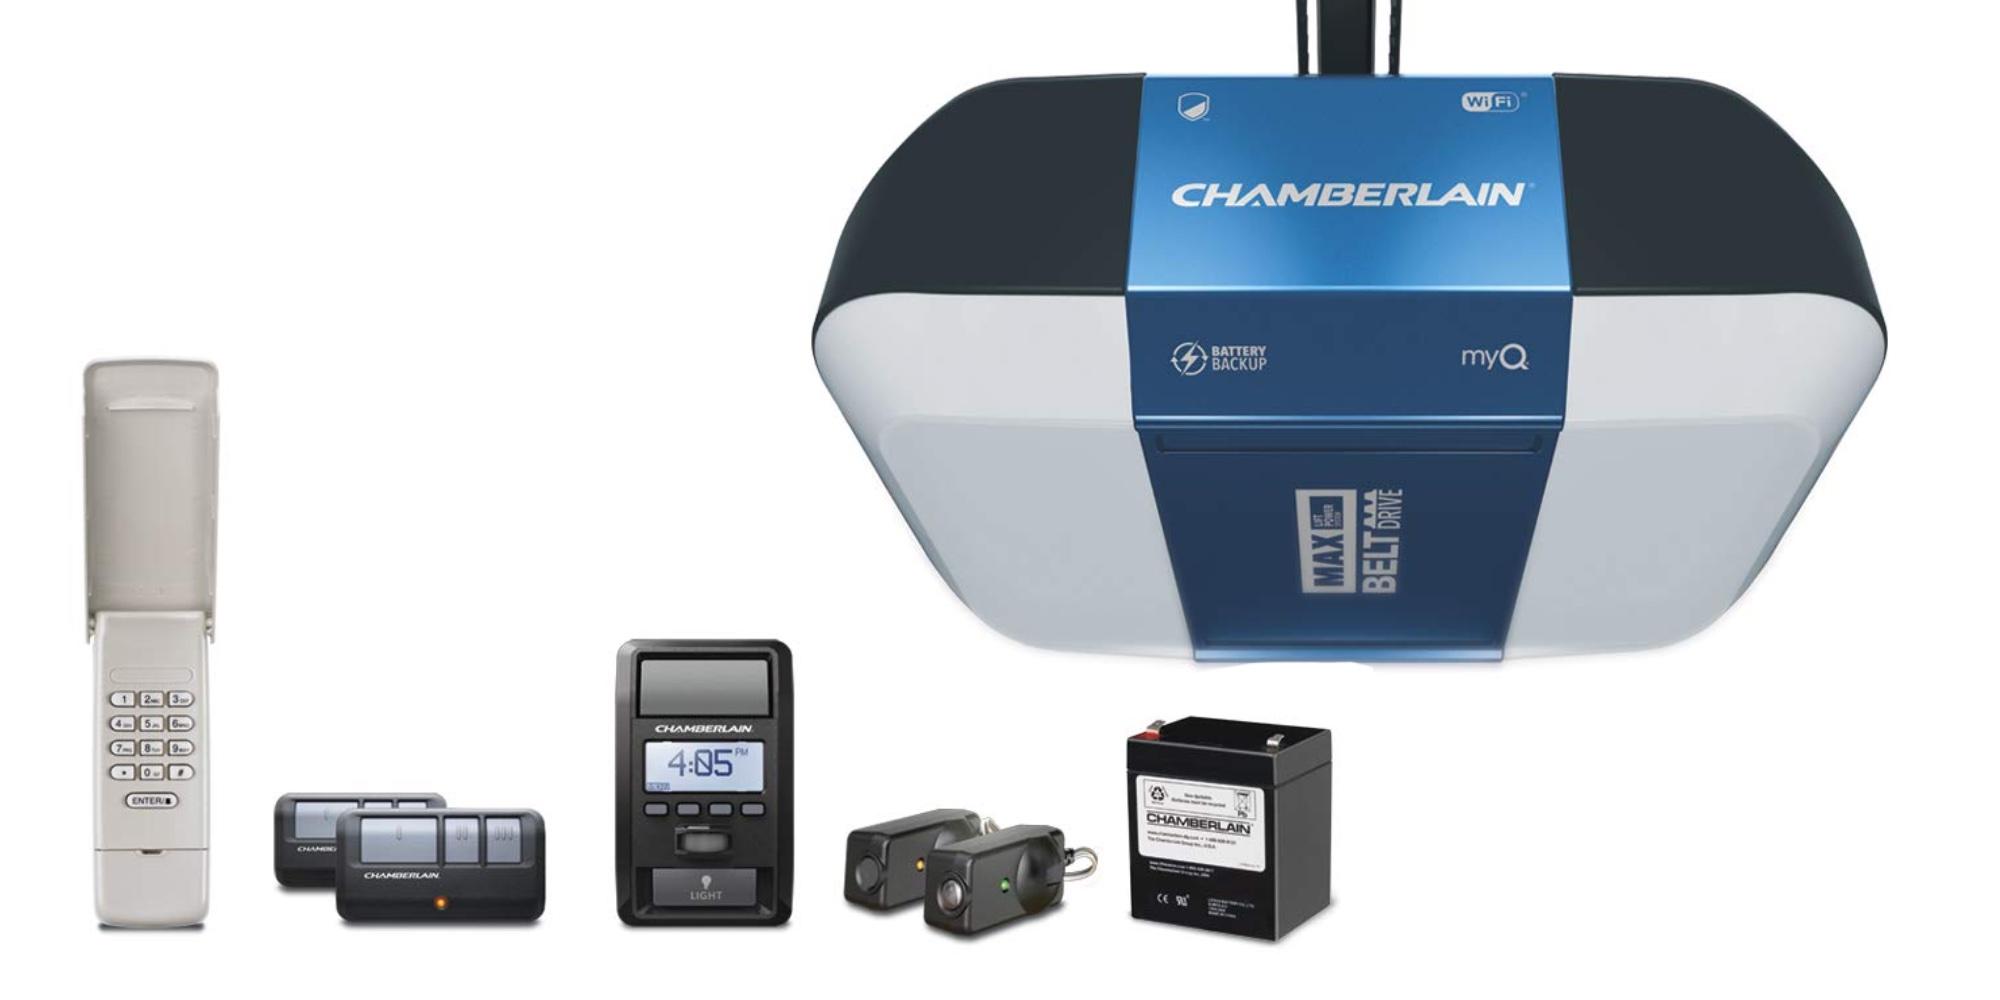 Chamberlain S Myq Smart Garage Door Opener Hits Amazon Low